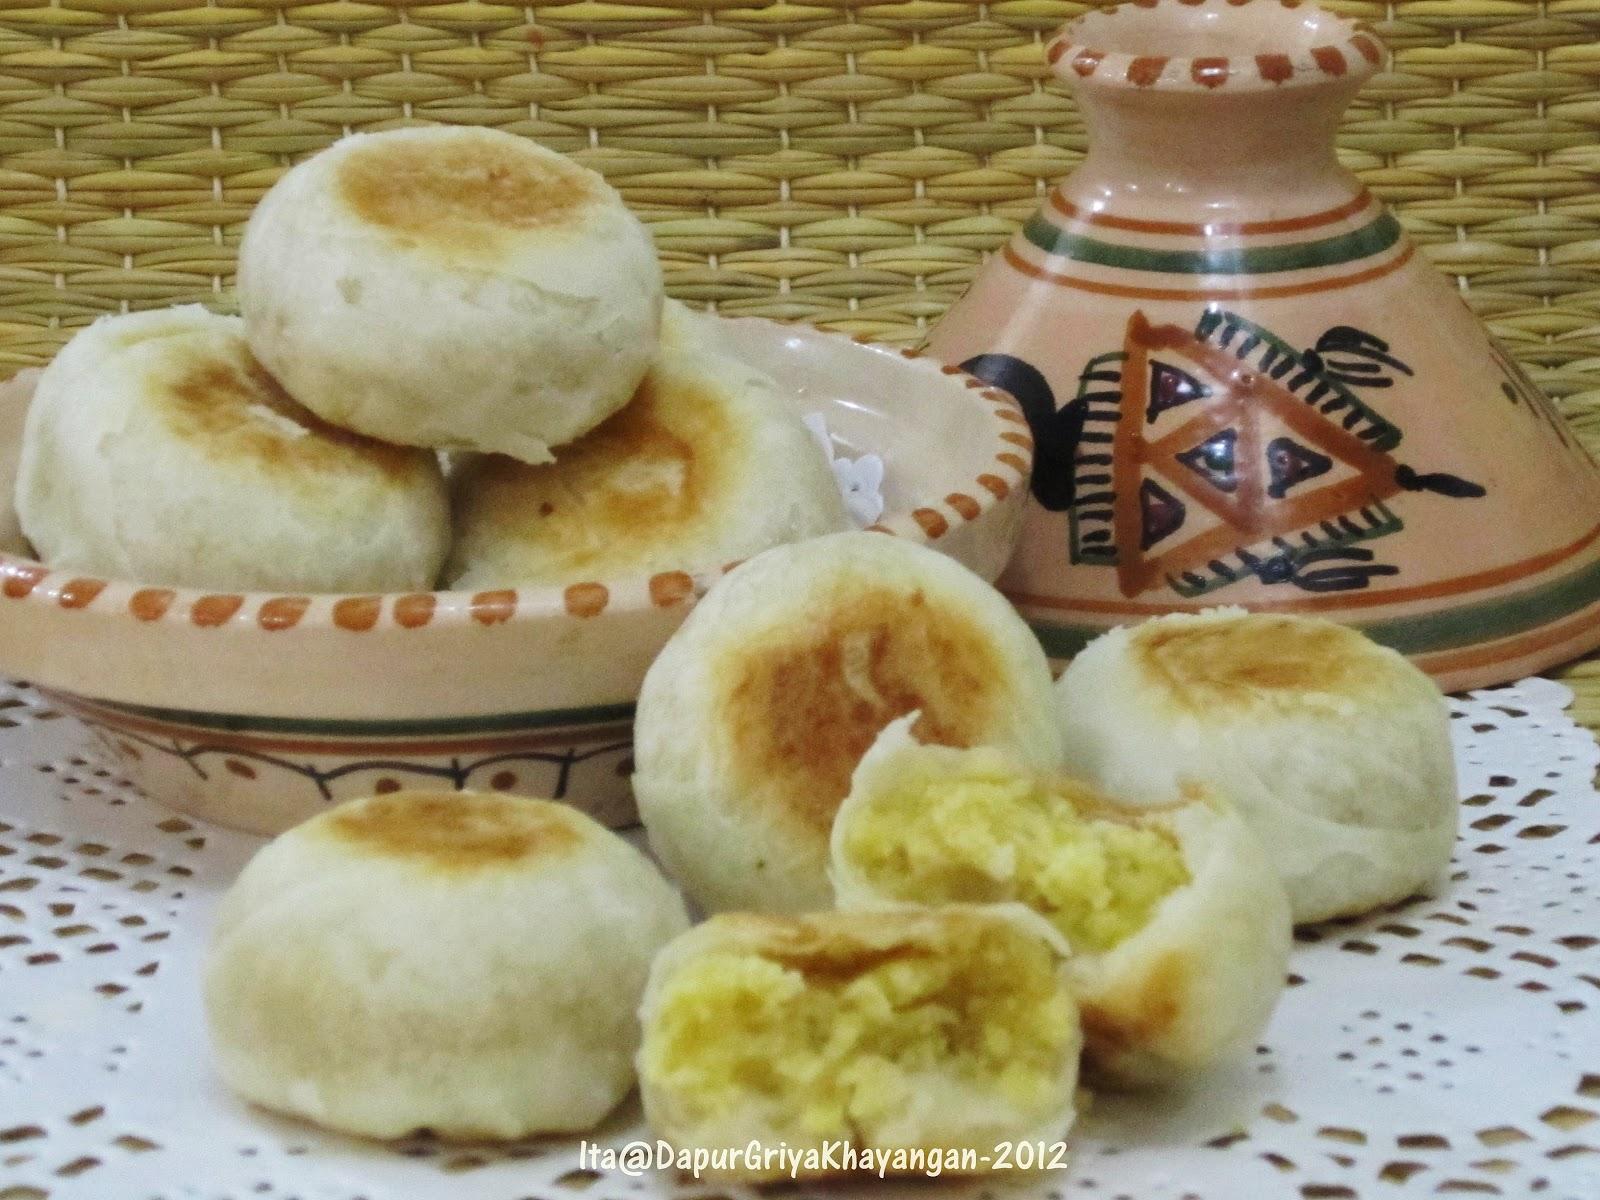 Dapur Griya Khayangan: Bakpia Isi Kacang Hijau